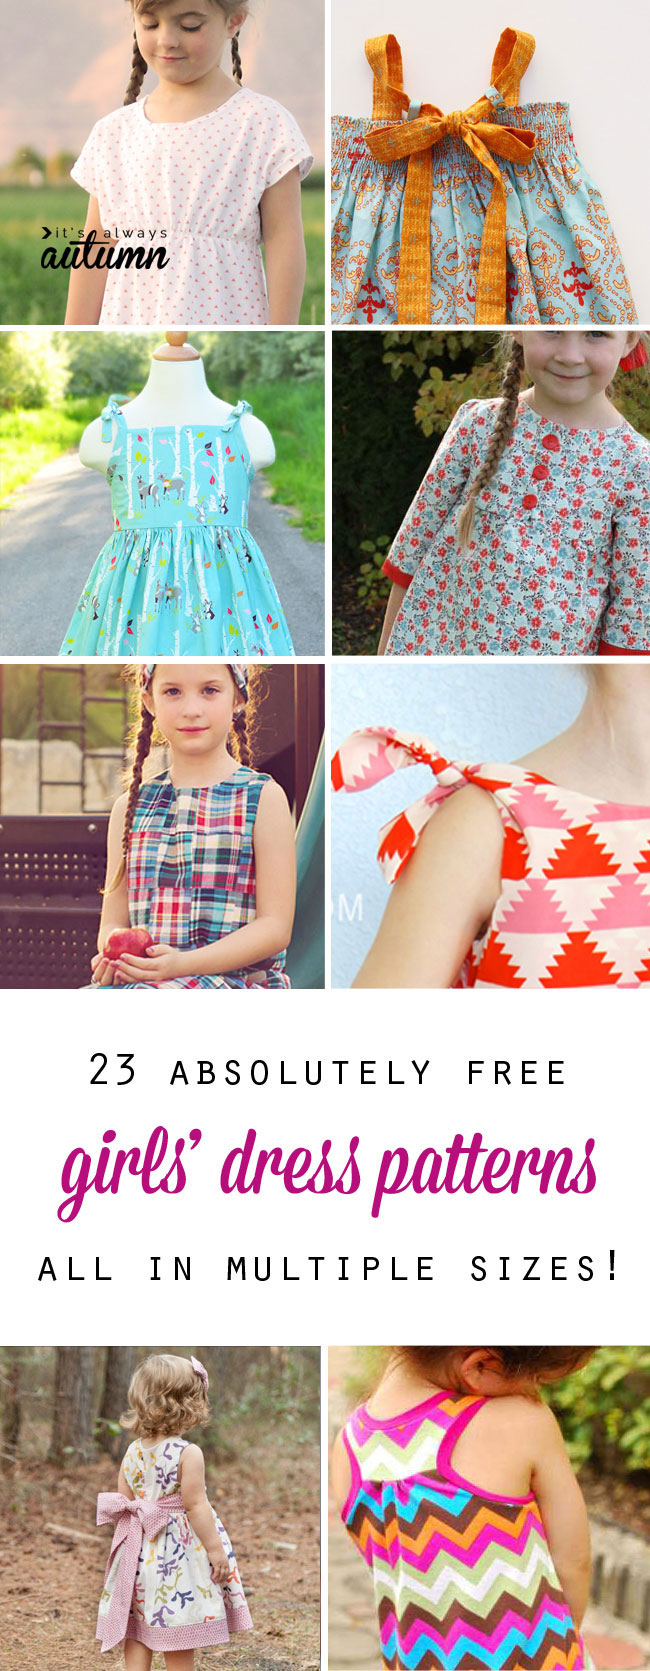 Free Girls' Dress Patterns & Charity Sewing - It's Always Autumn - Free Printable Toddler Dress Patterns